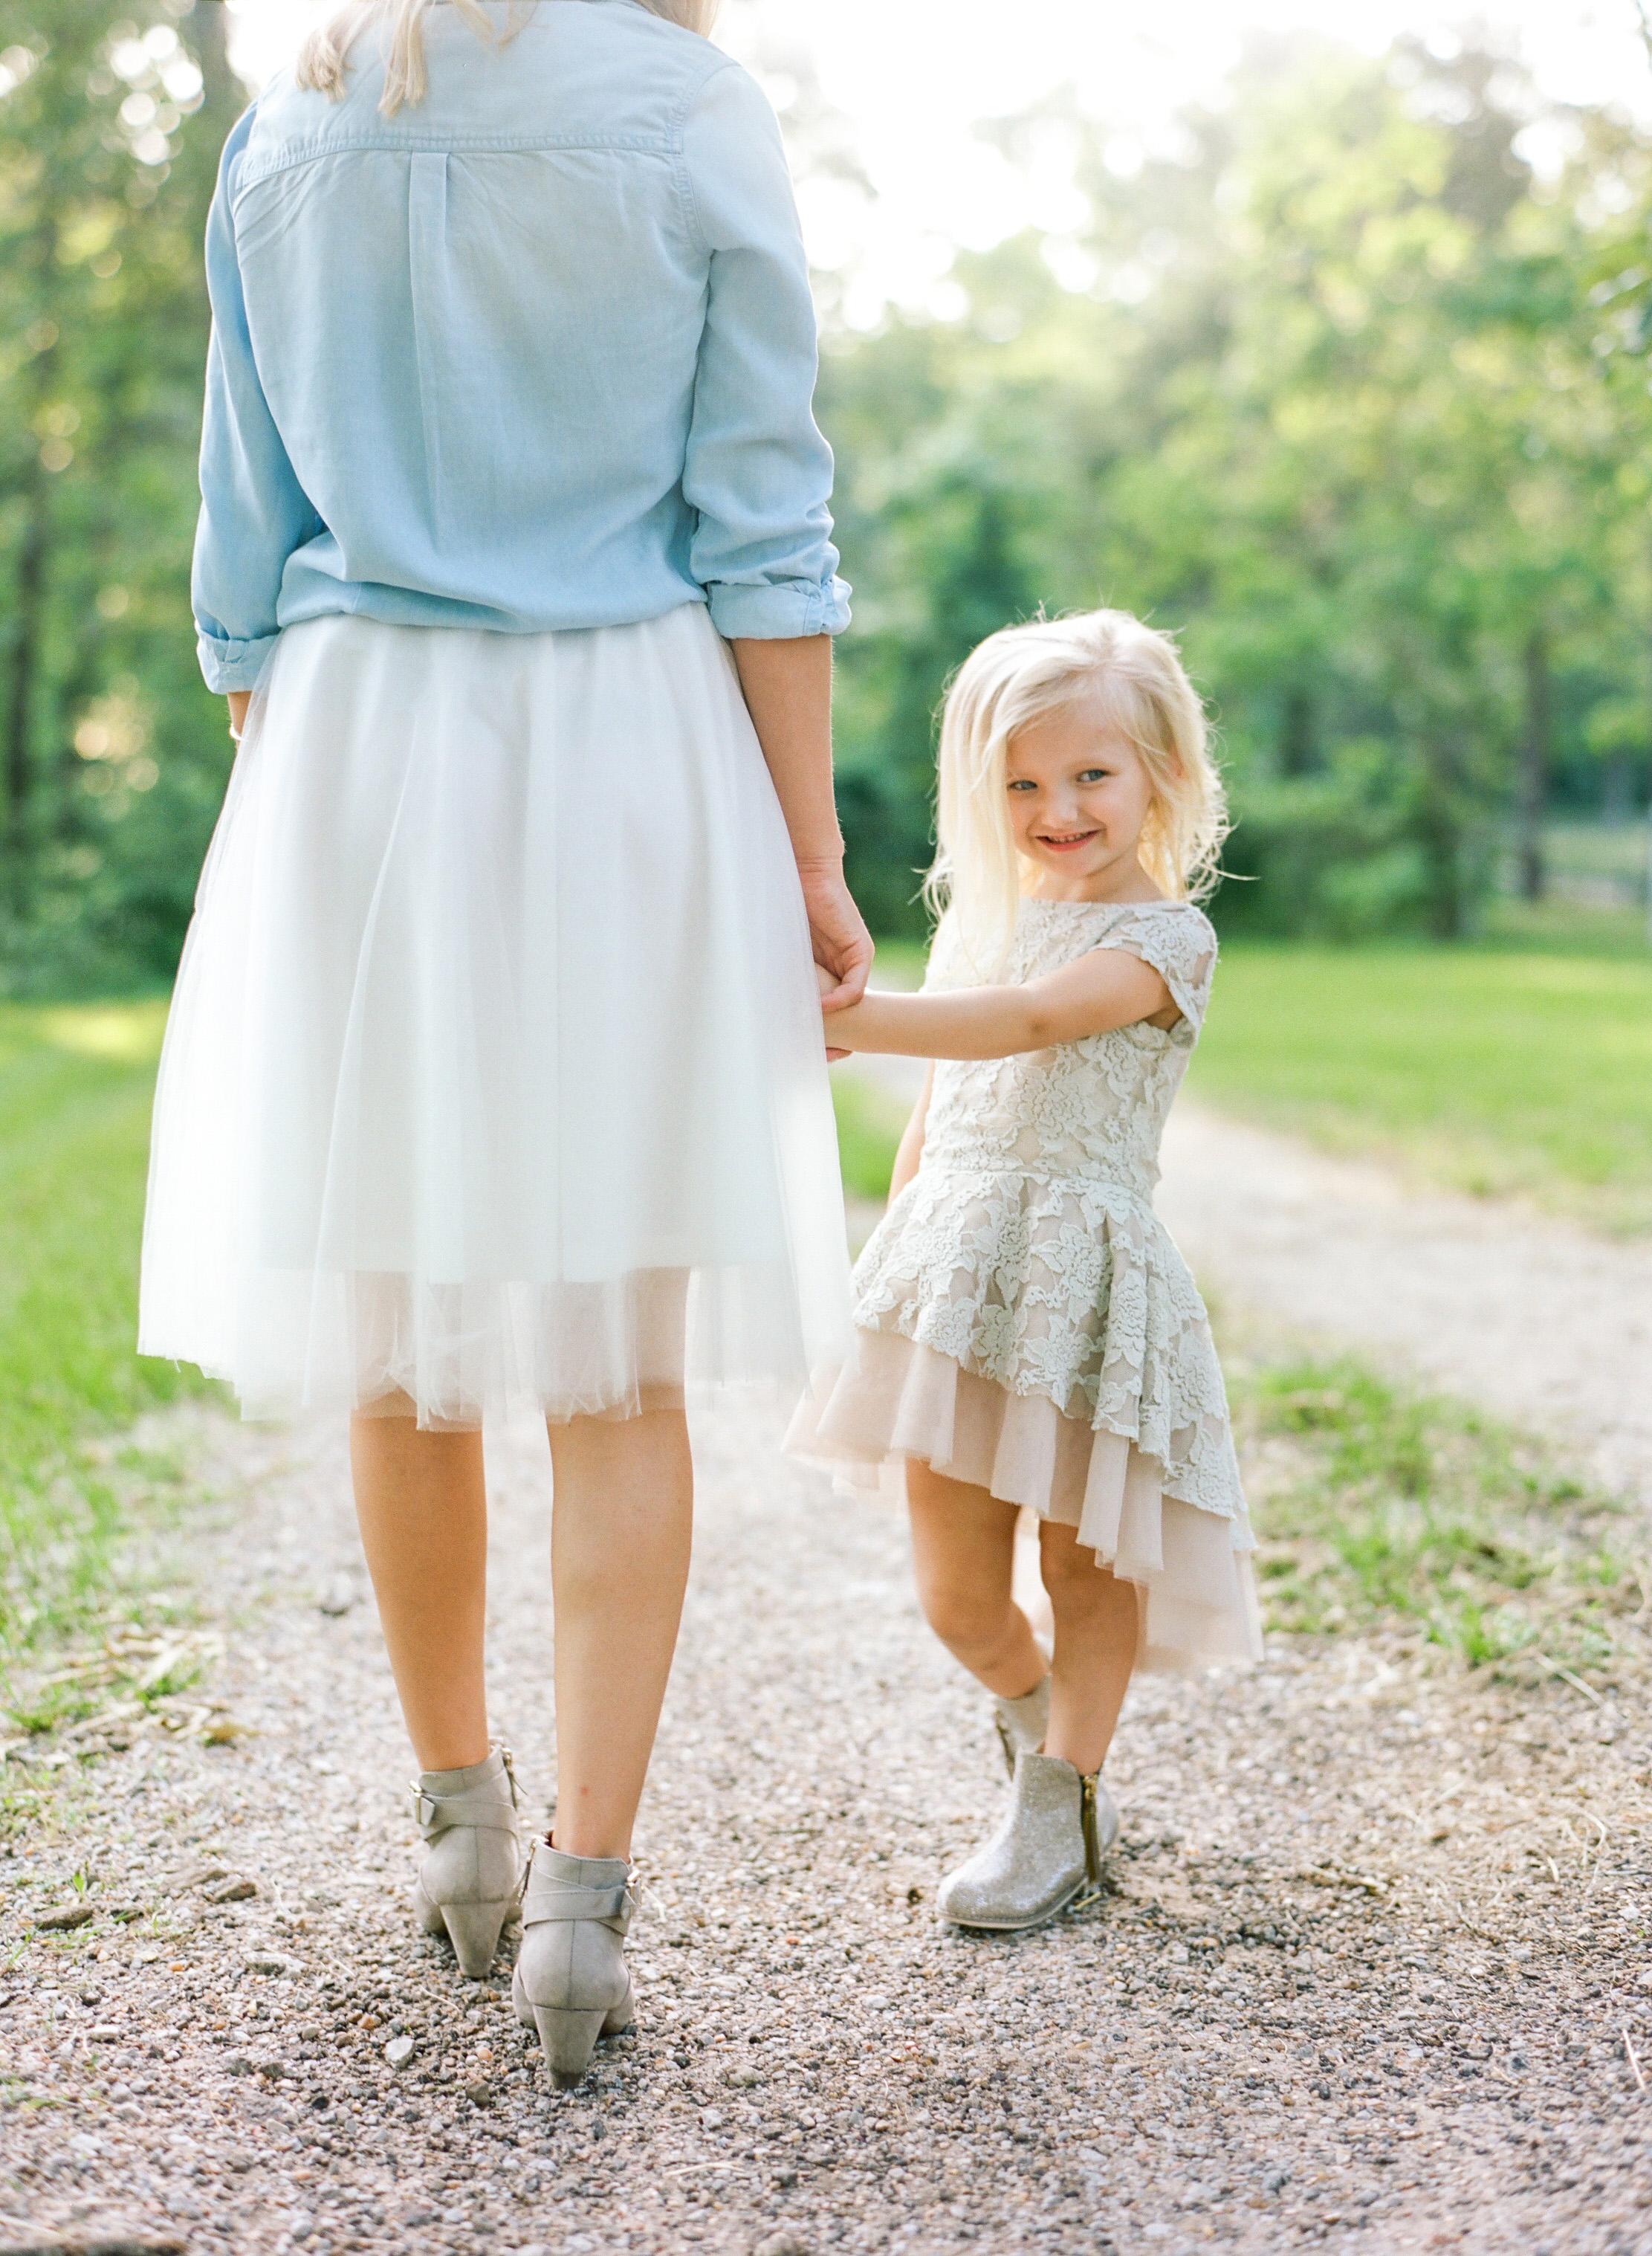 Dana-Fernandez-Photography-Houston-Portrait-Photographer-Film-Children-Family-Maternity-Senior-Photographer-12.jpg